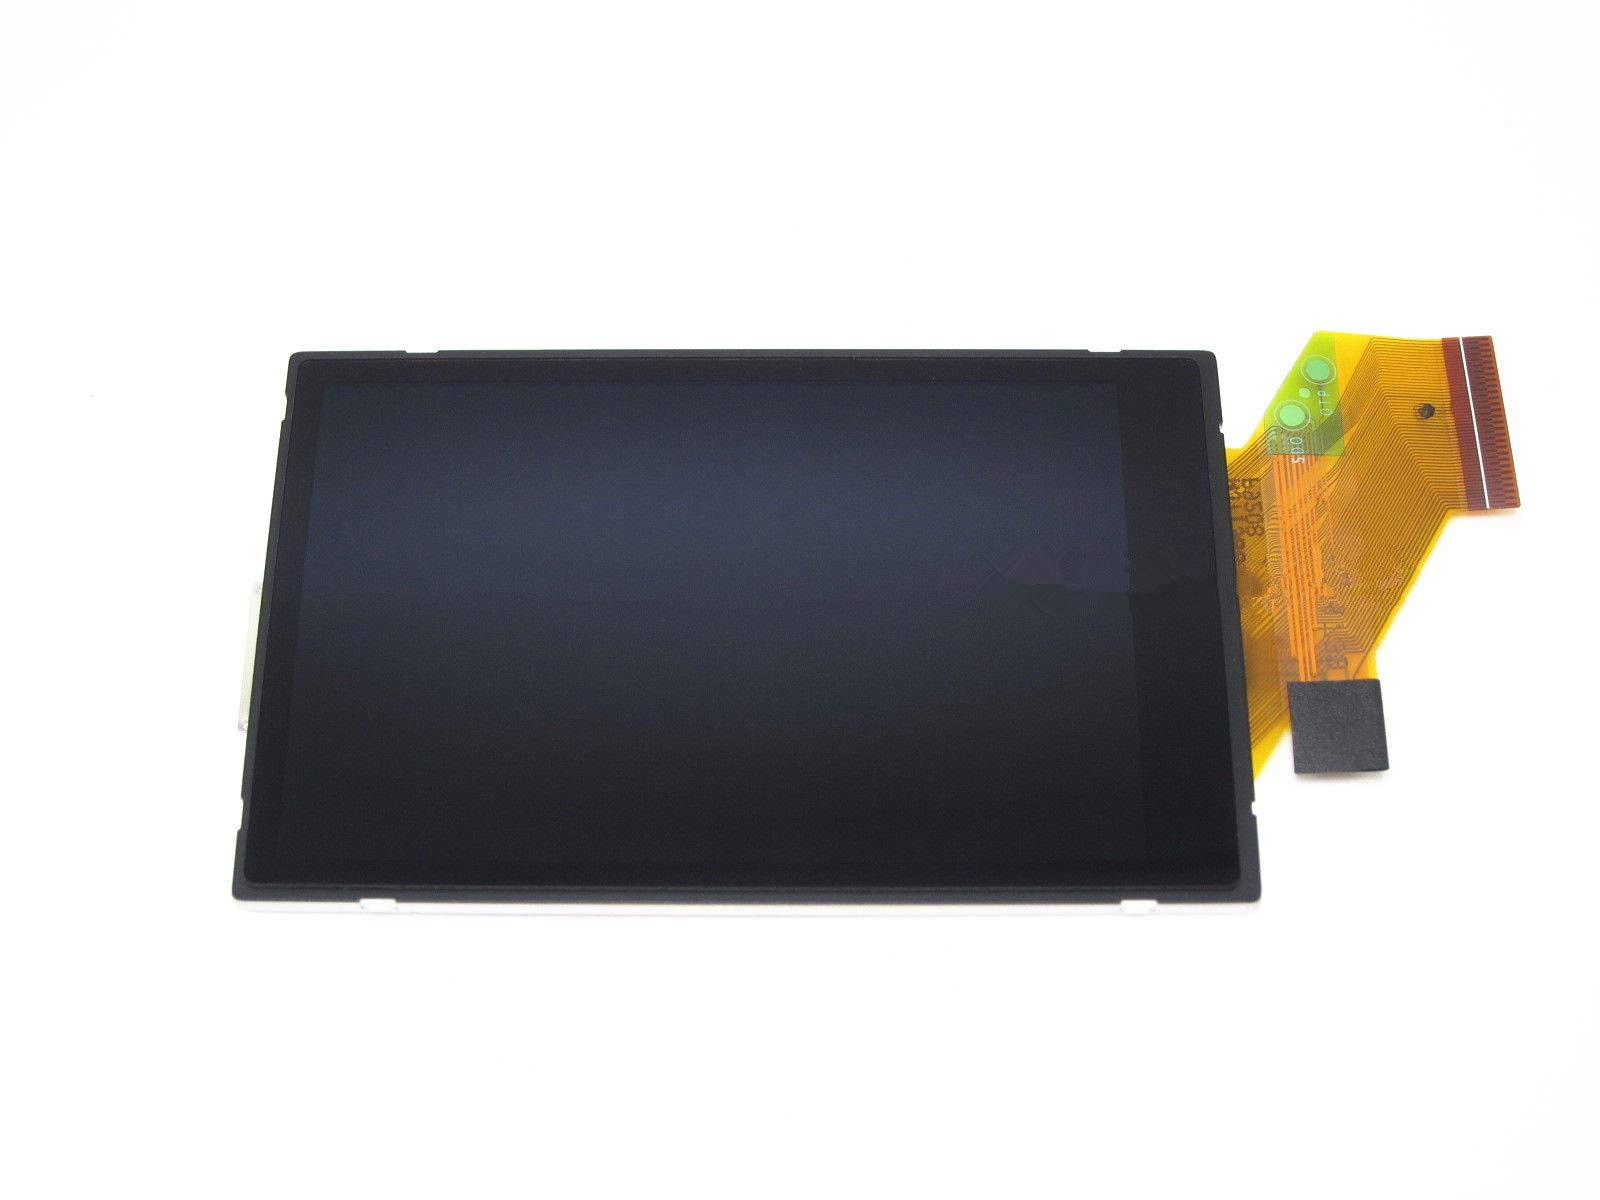 Replacement New LCD Display Screen L5BDDYY00153 for Panasonic Lumix TZ70 ZS50 DMC-TZ70 DMC-ZS50